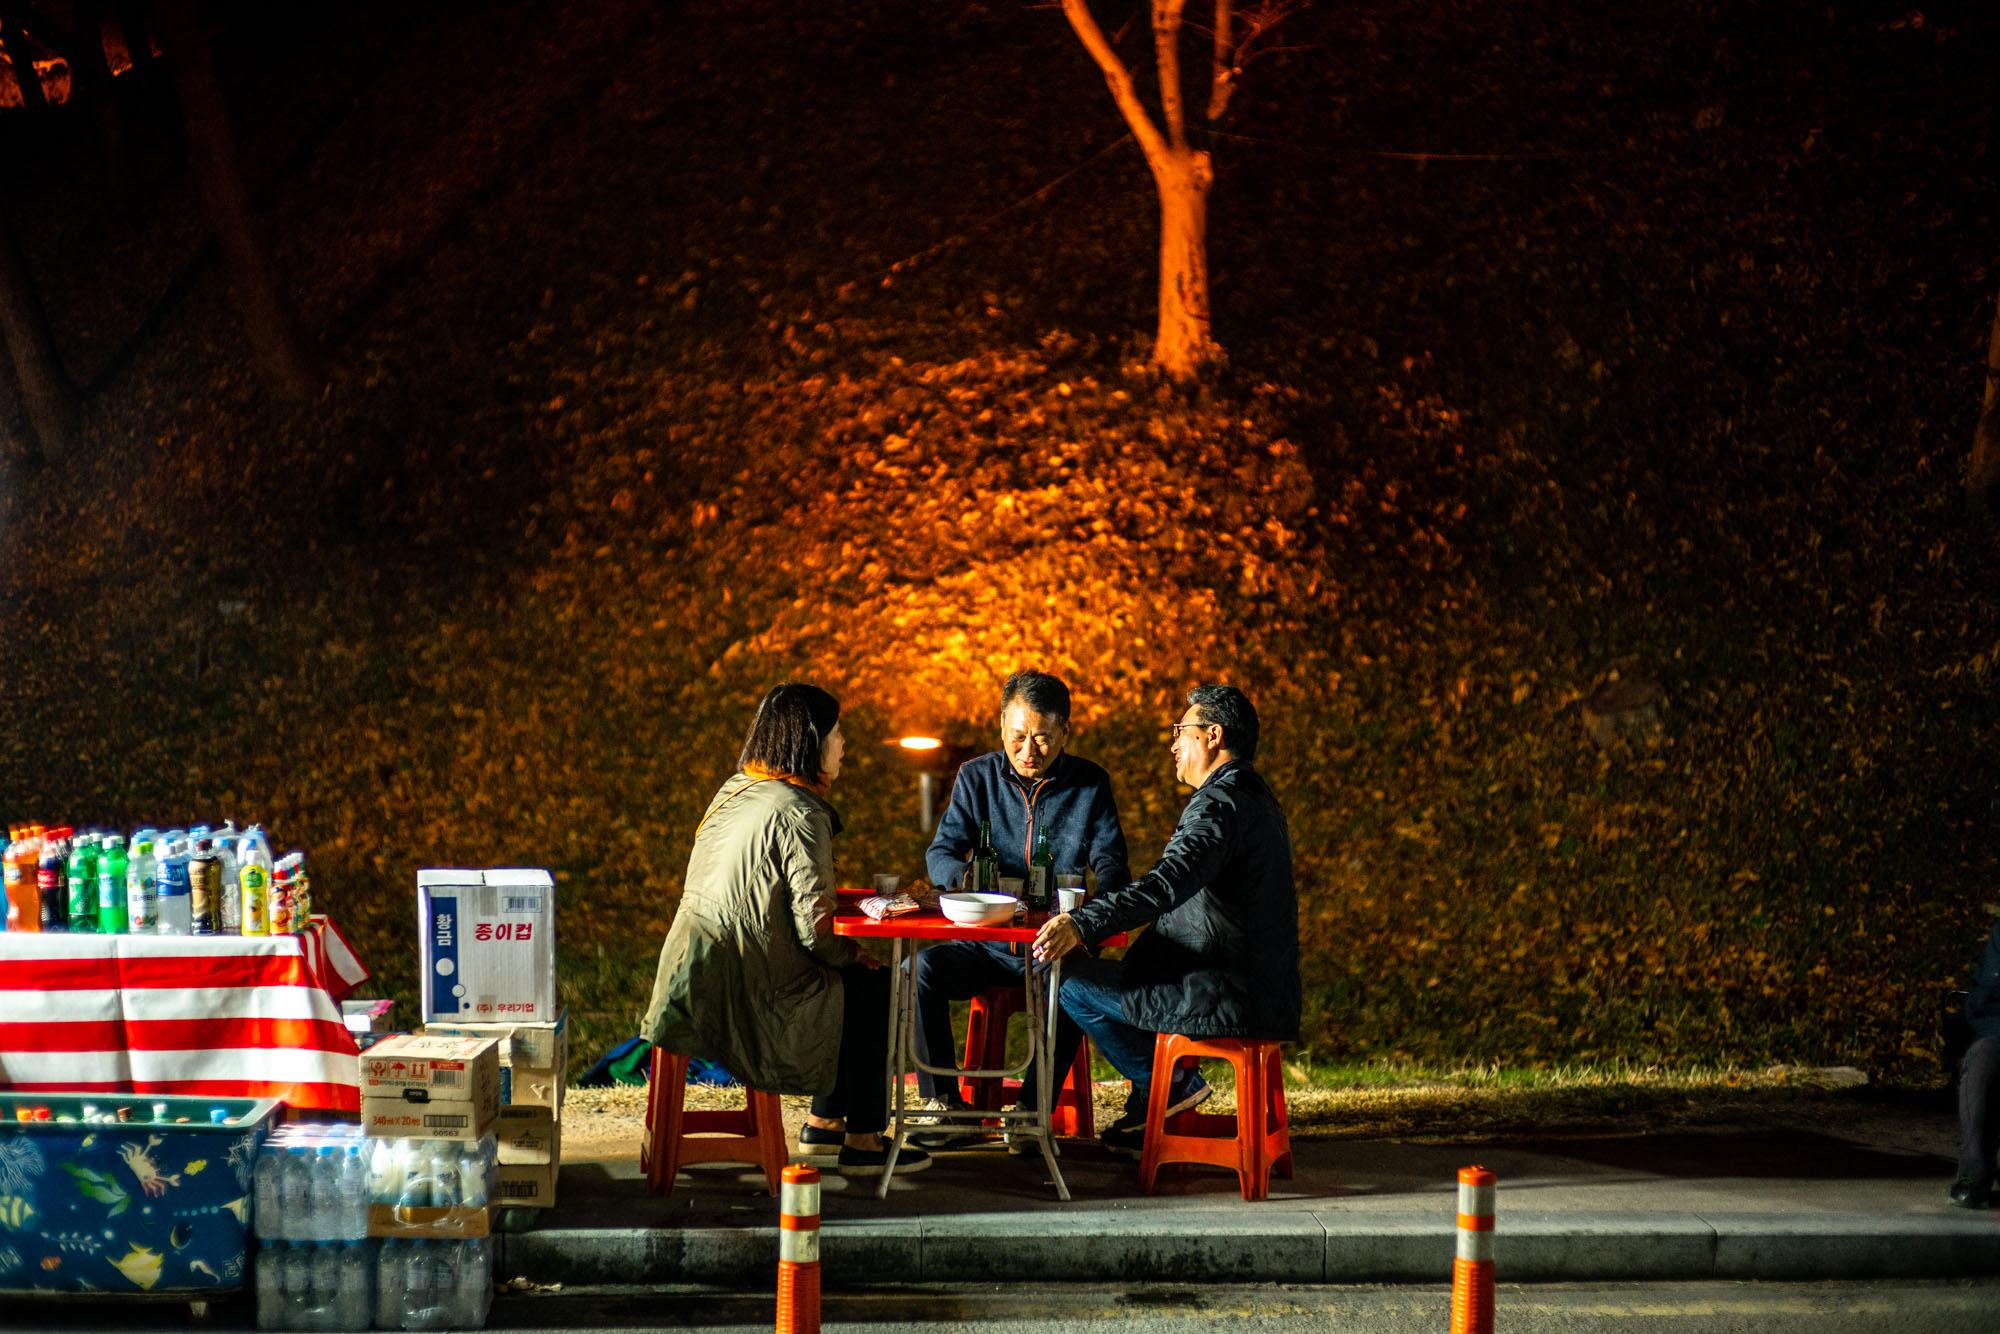 gyeongju-day-night-denis-bosnic-27.jpg